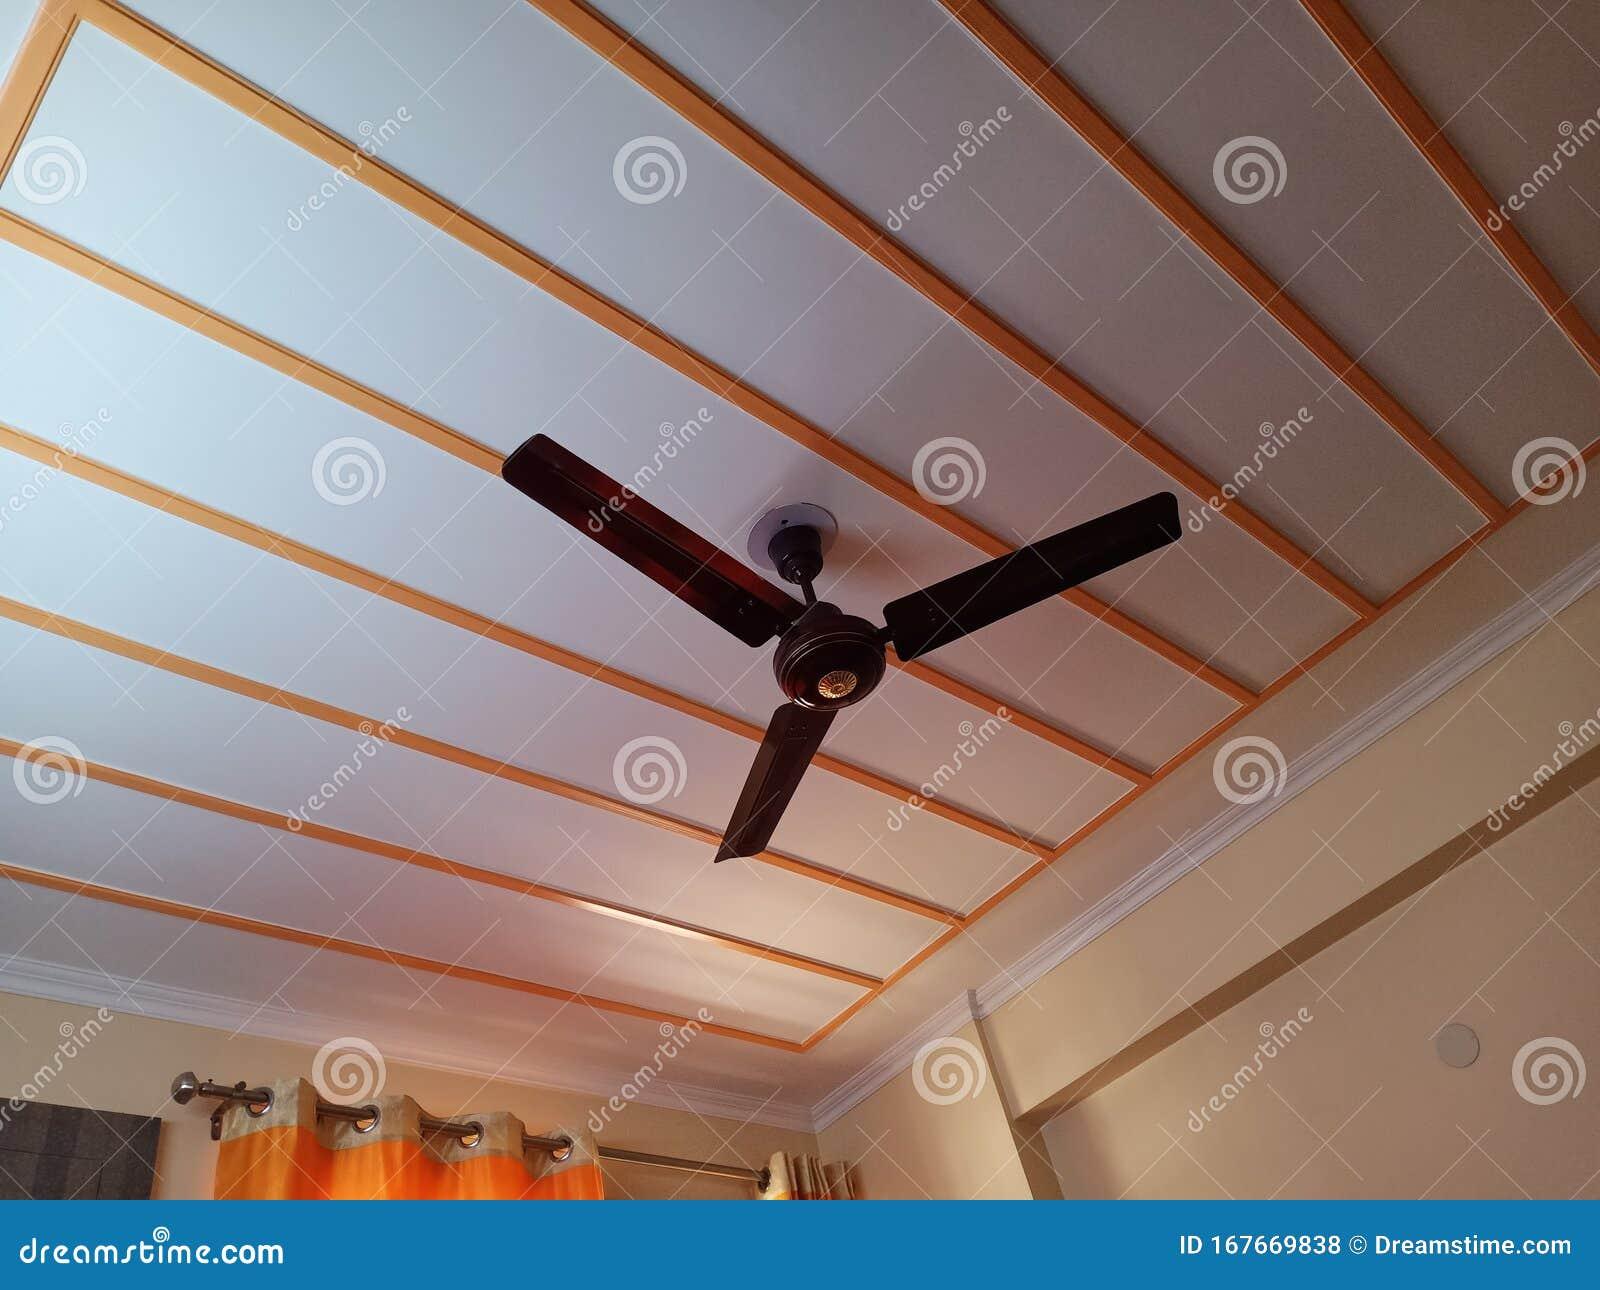 Interior Designs Pop Designs Stock Photo Image Of Roof Interior 167669838